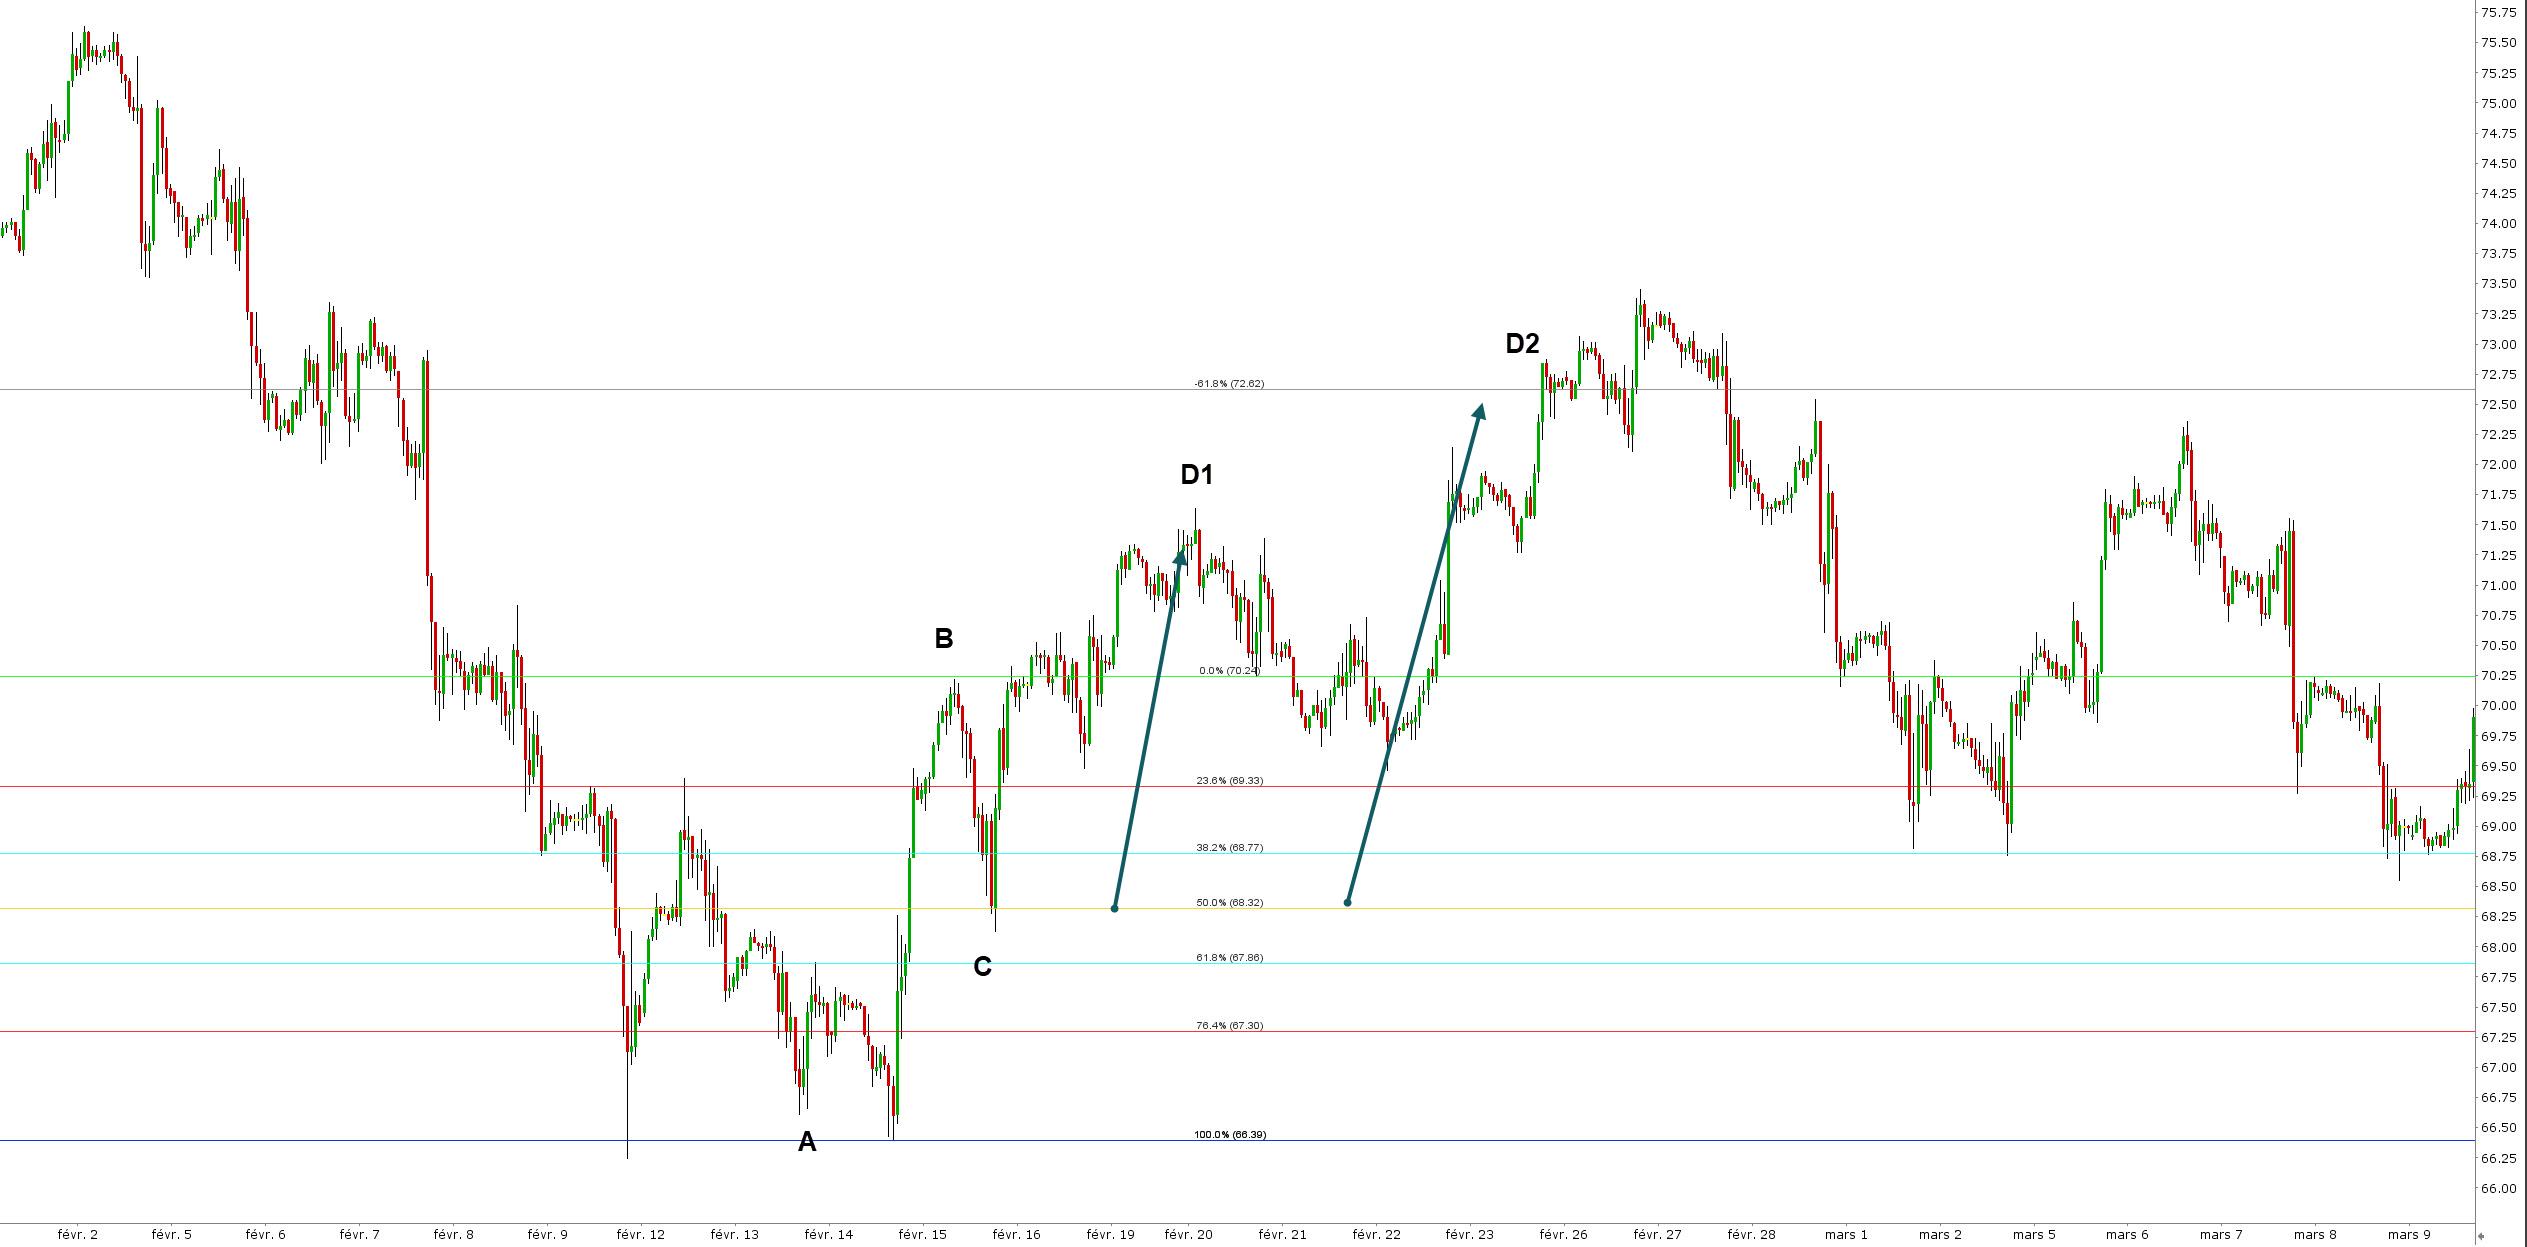 Fibonacci trading illustration extensions